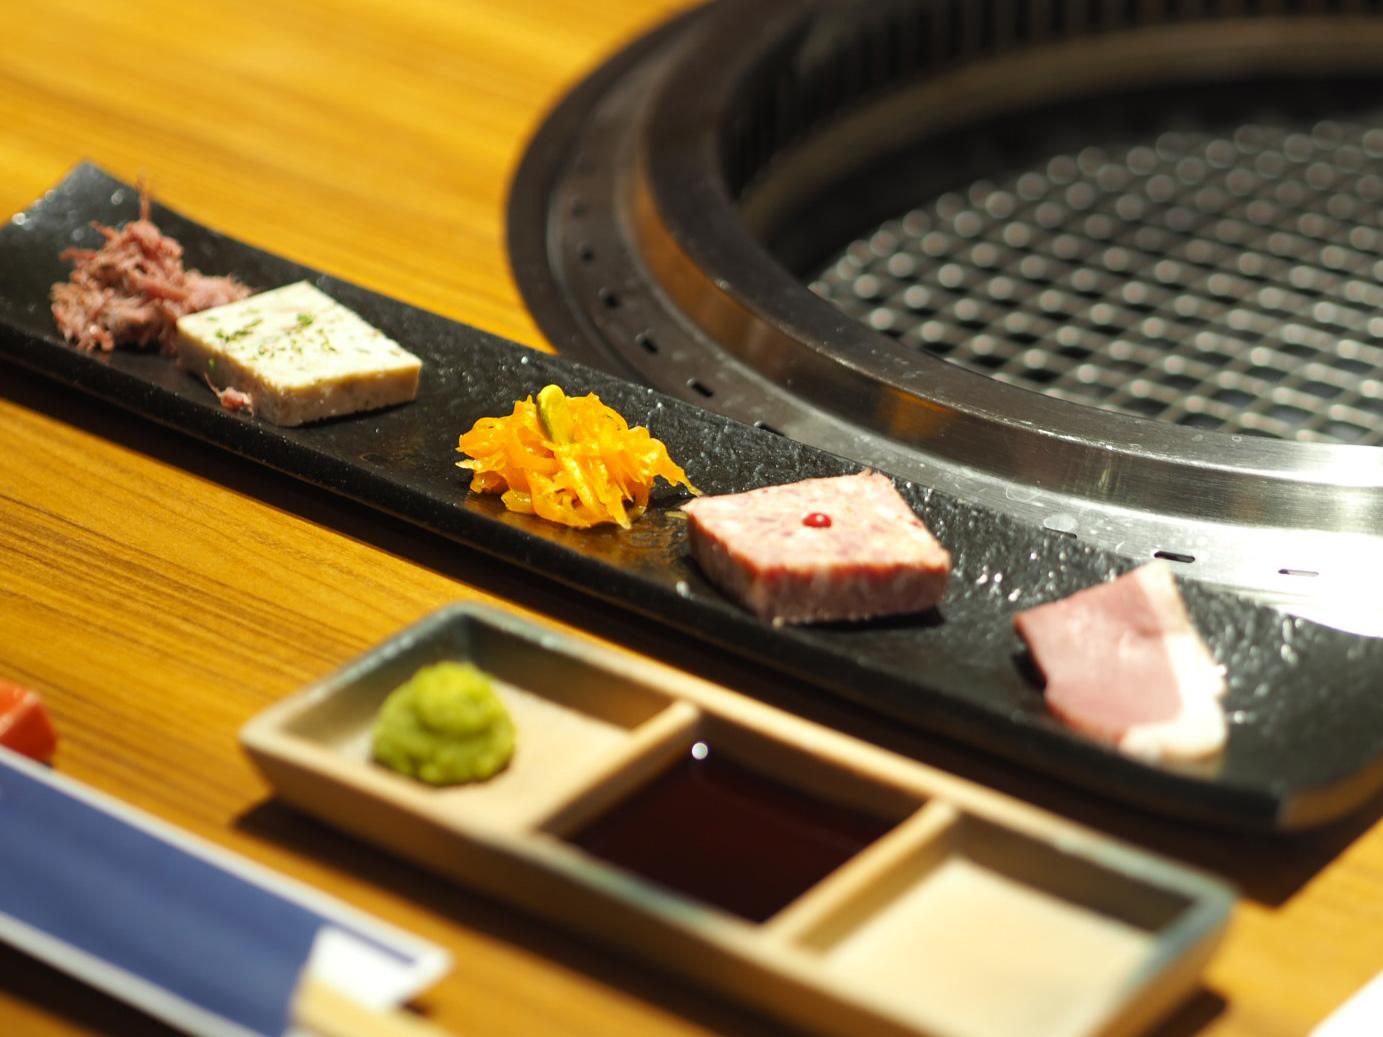 CheRish meat 肉おじさん by格之進